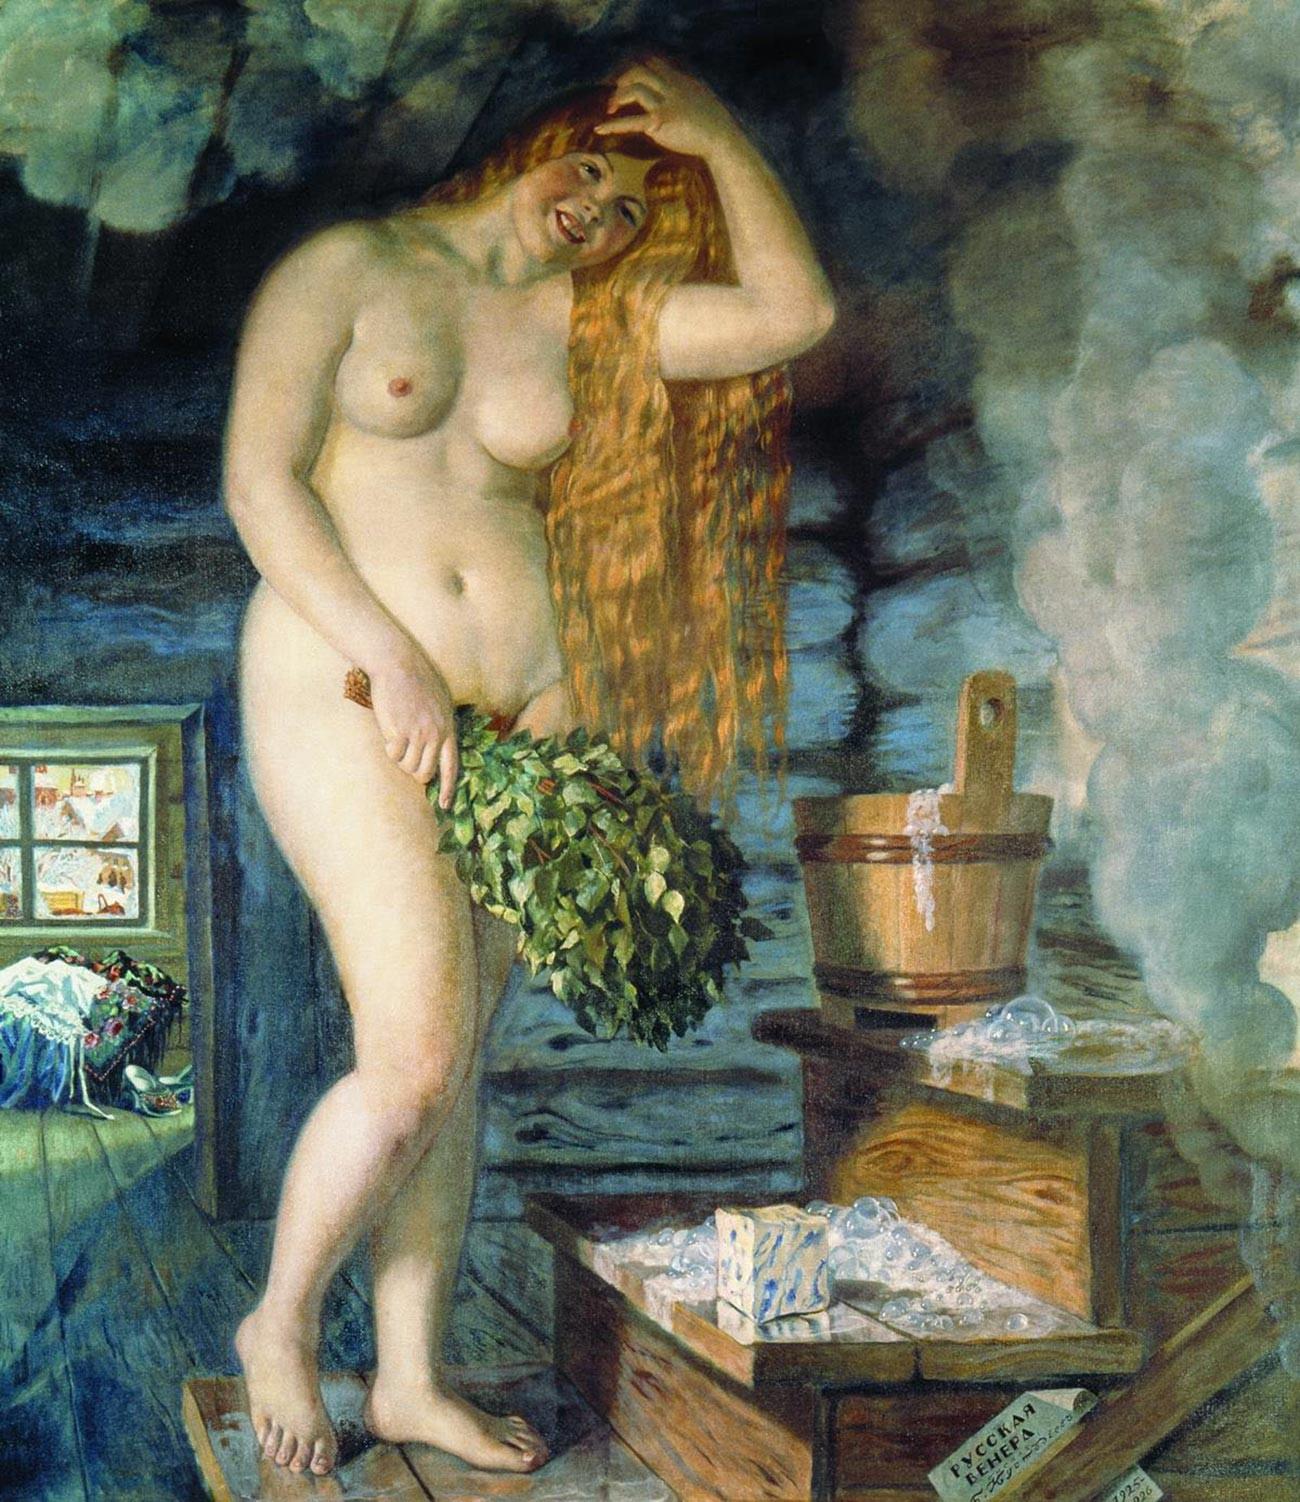 Russische Venus von Boris Kustodijew